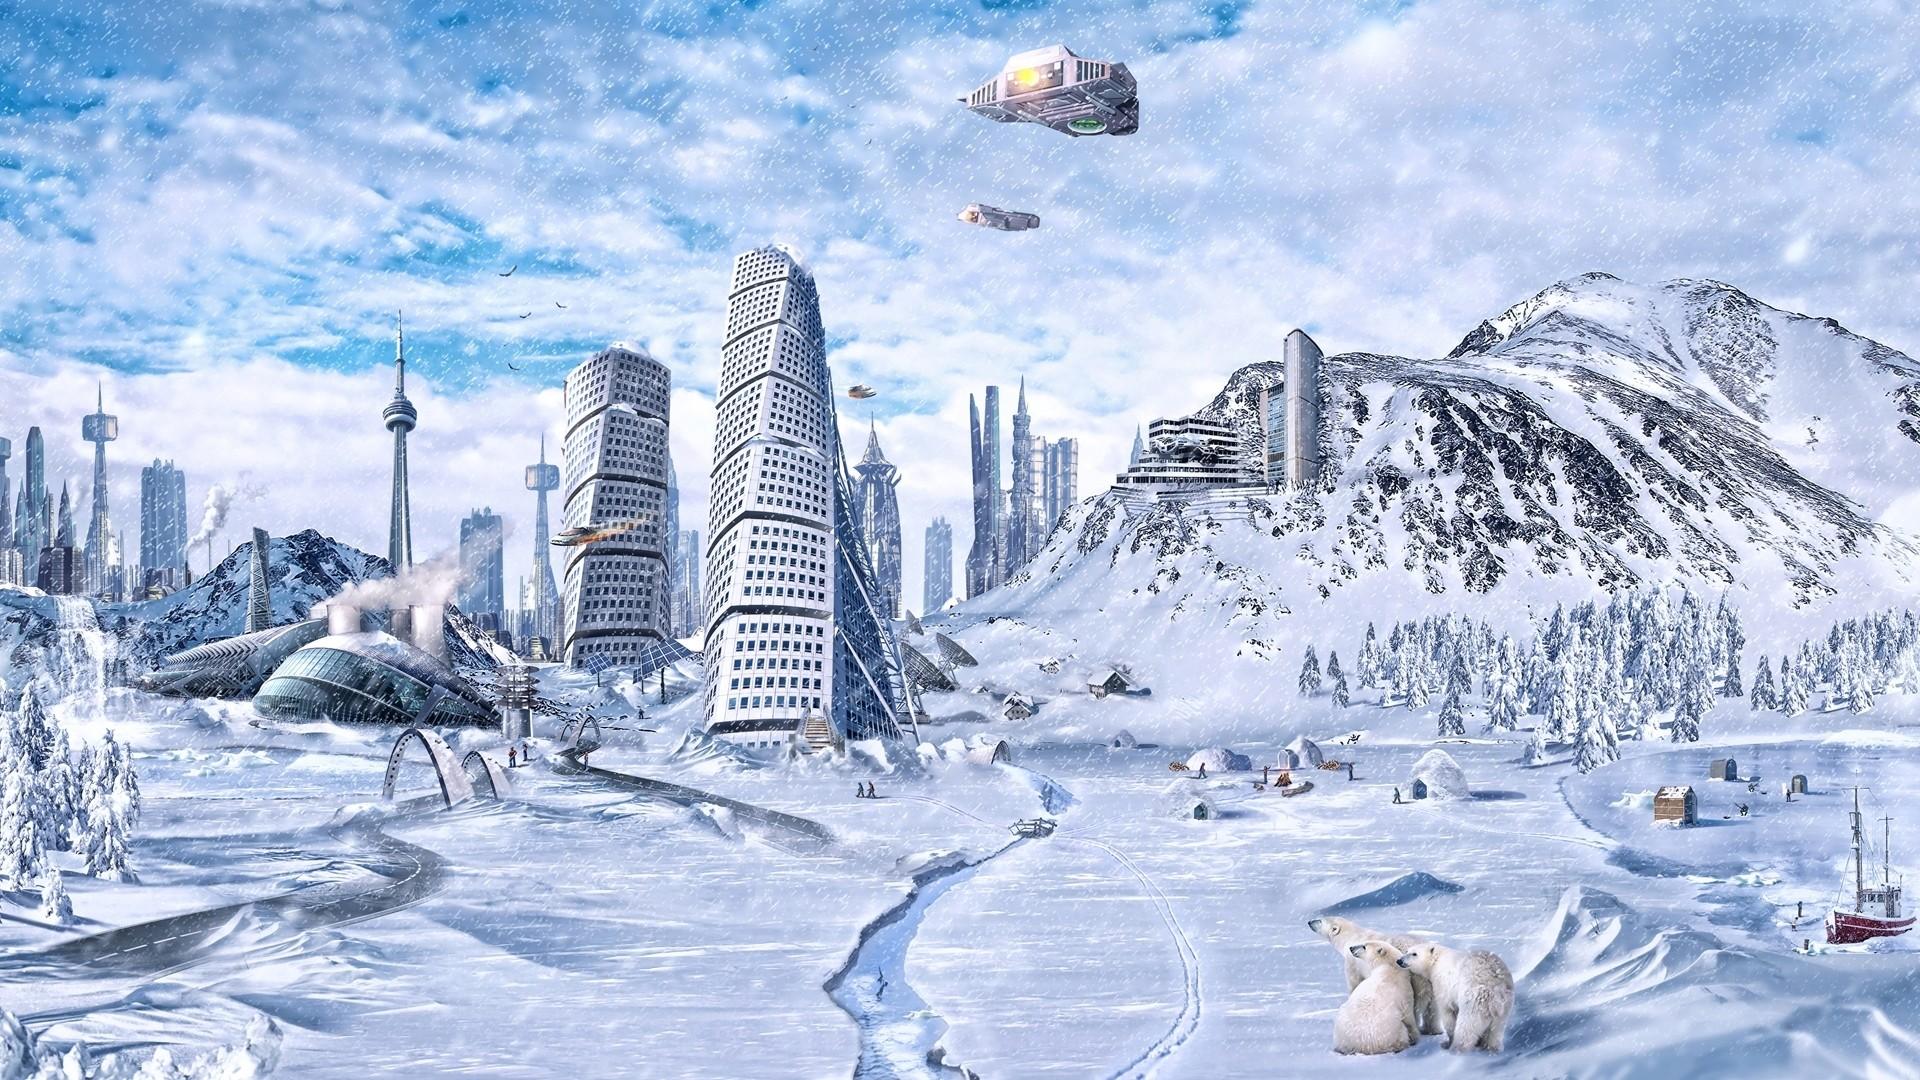 Wallpaper planet, world, winter, snow, city, science fiction,  future